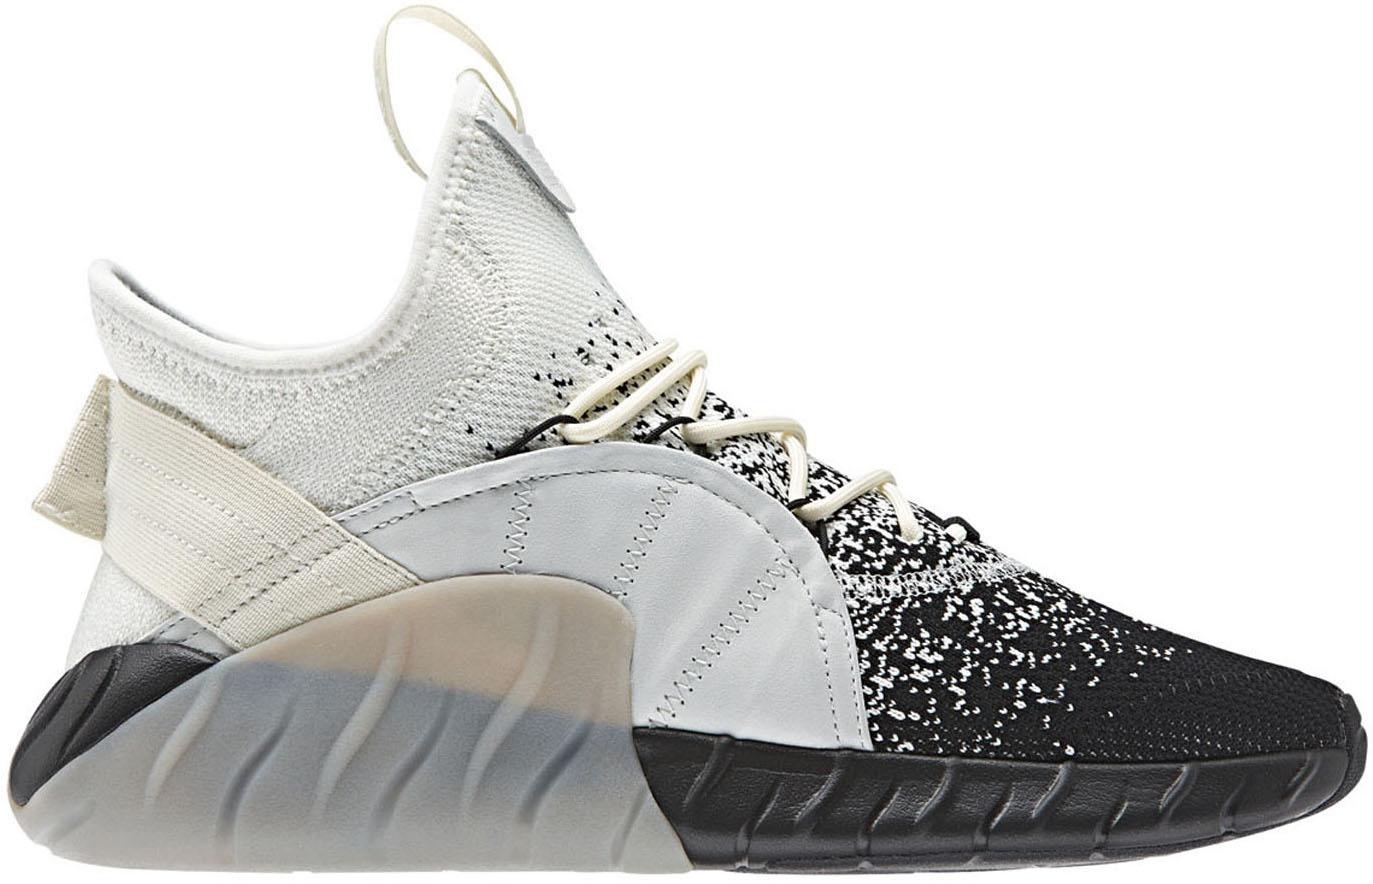 adidas Tubular Rise PK White Black Grey - CQ0924